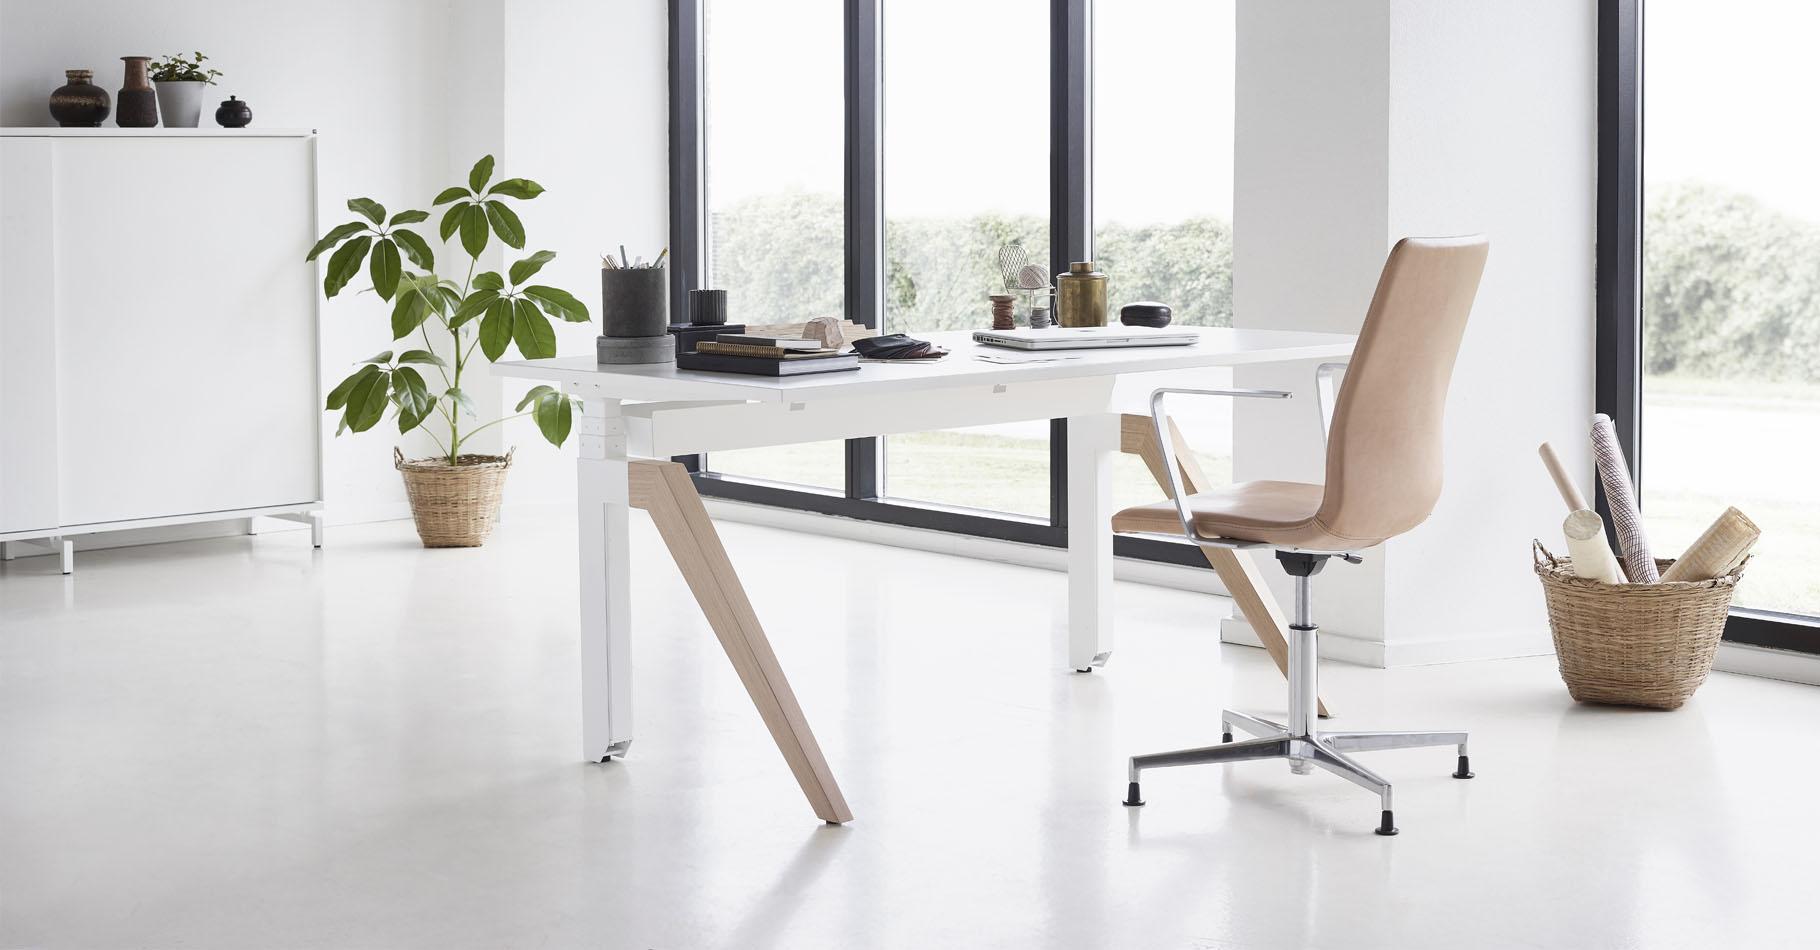 Cabale-desk-groovy-cc-stol